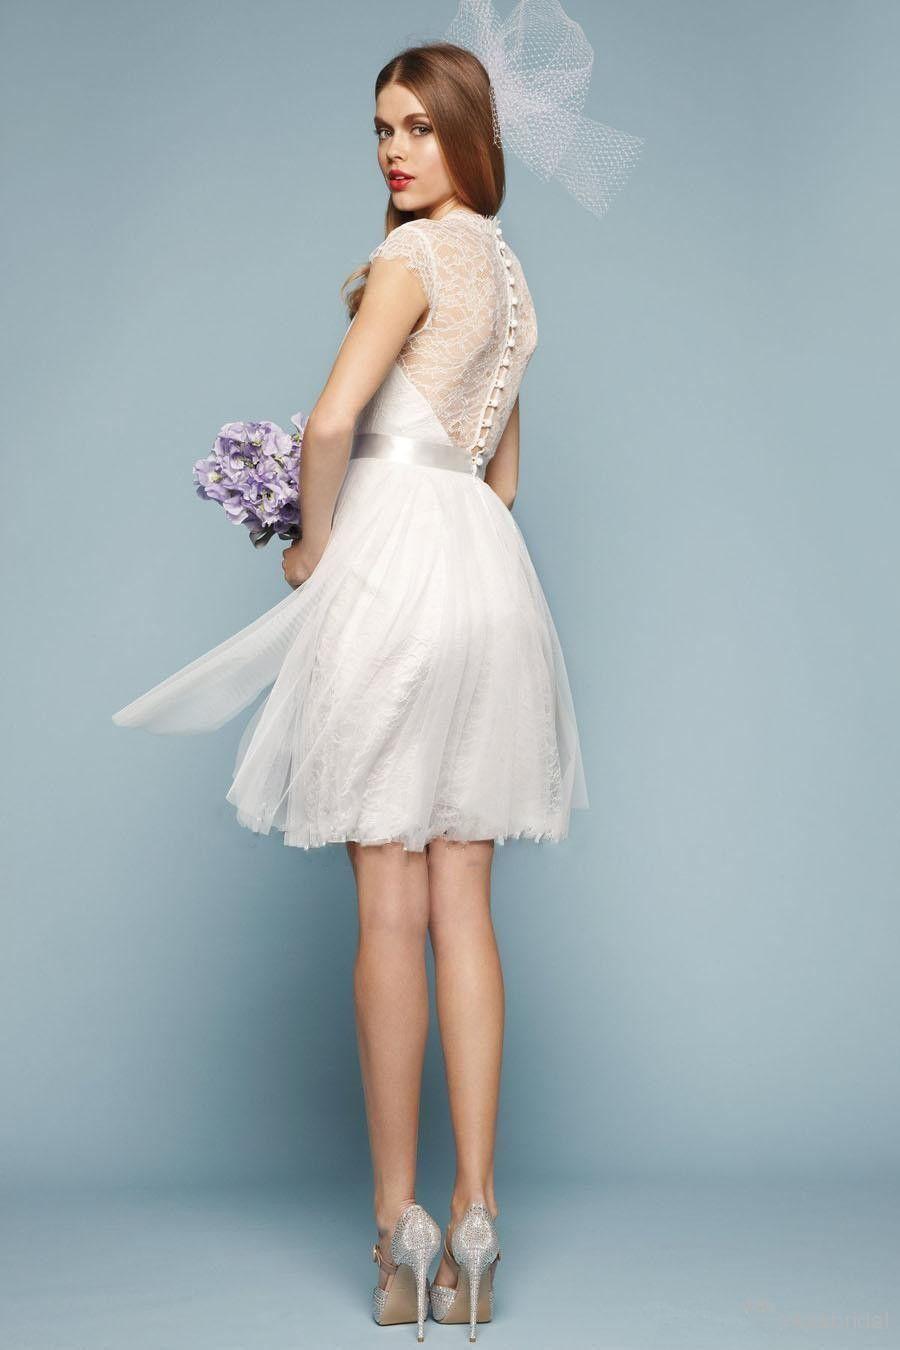 wedding dresses short Short Wedding Dress Colors http www redwatchonline org short